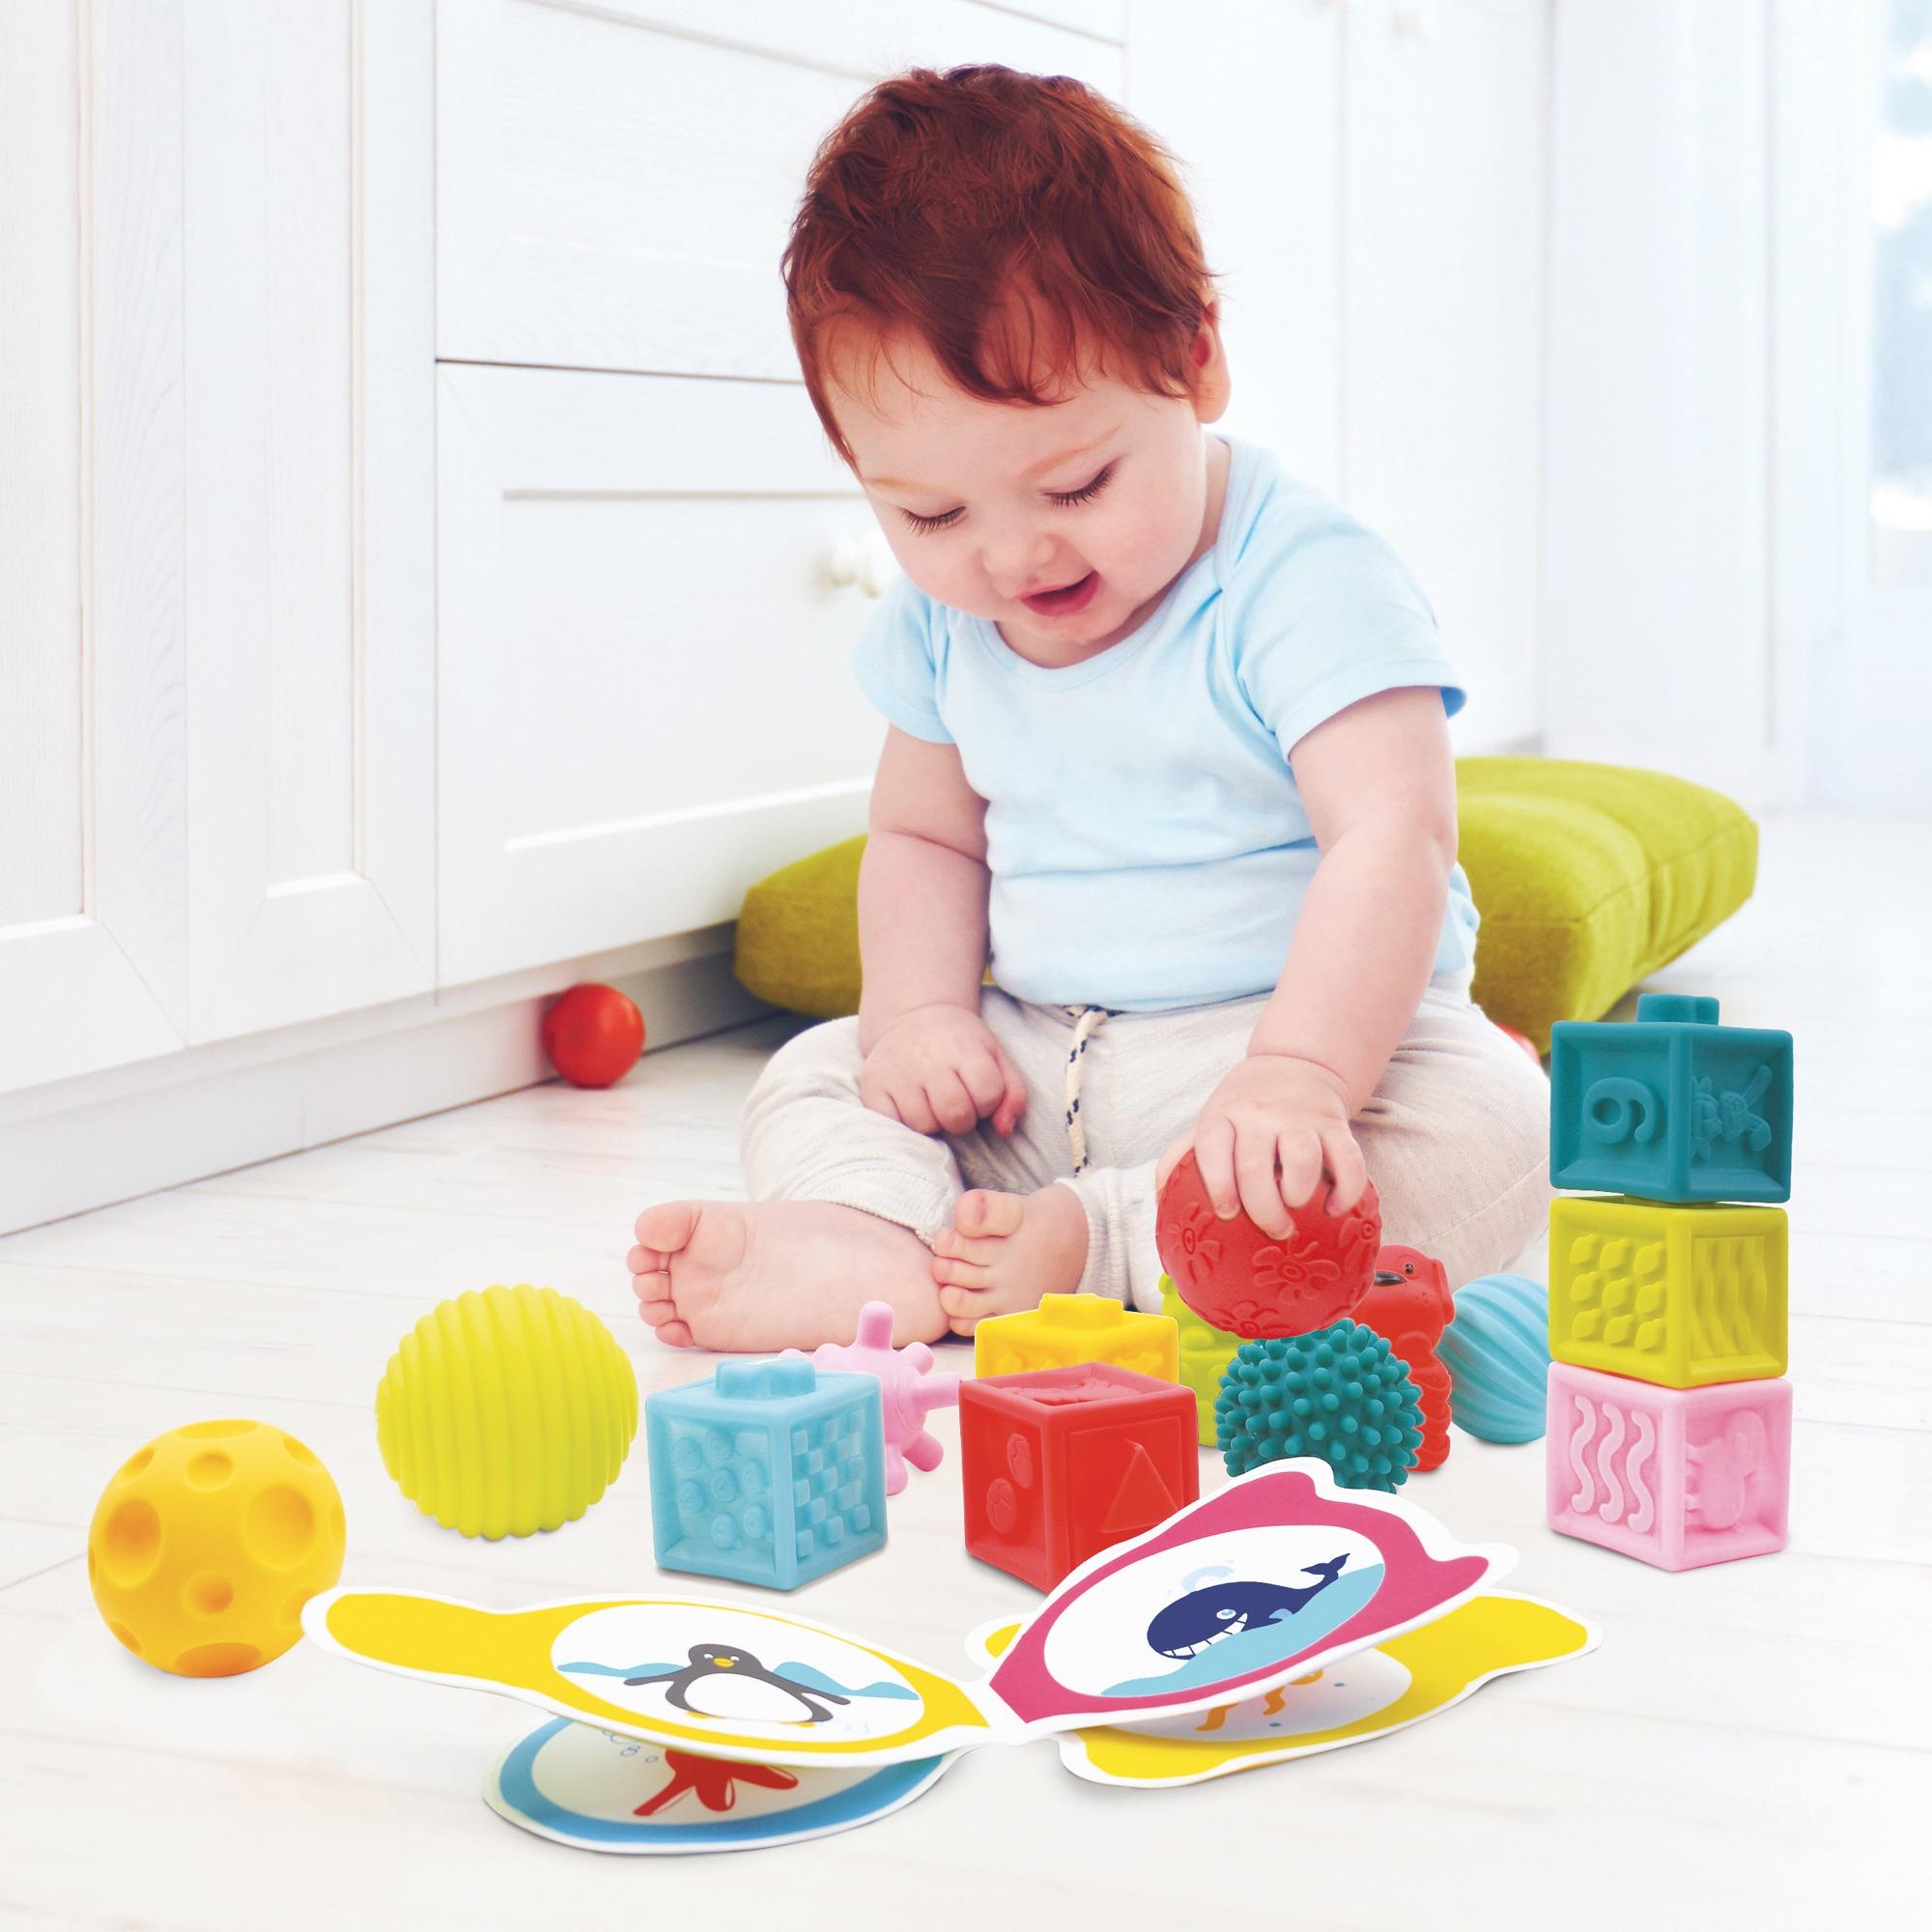 Baby Sensory awakening set